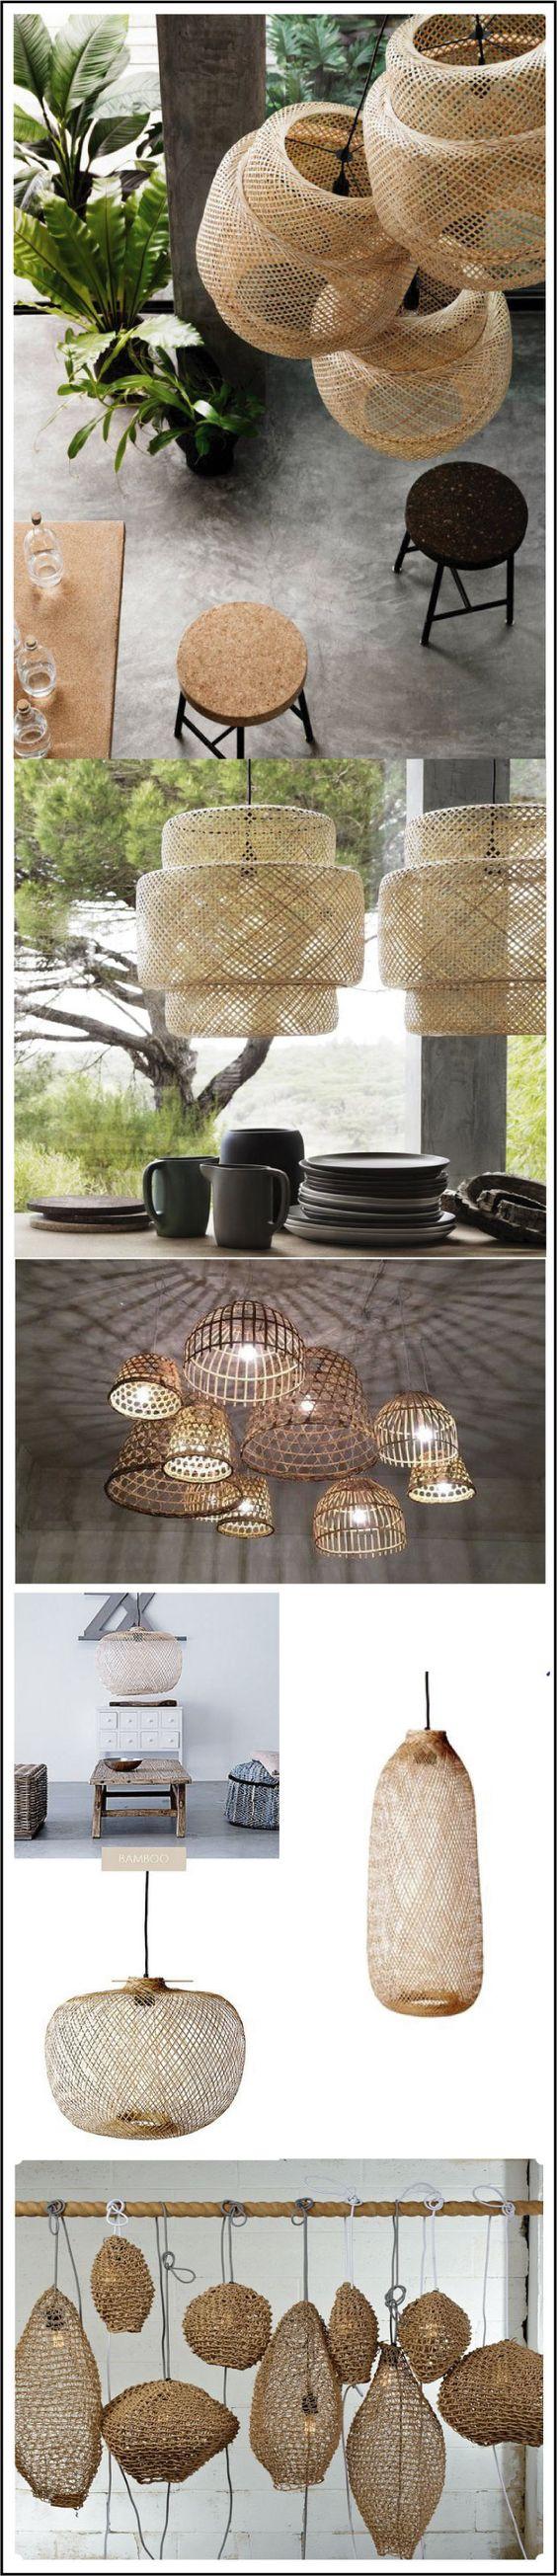 tendance rotin osier luminaires en rotin chiara stella home ting kj pe pinterest. Black Bedroom Furniture Sets. Home Design Ideas